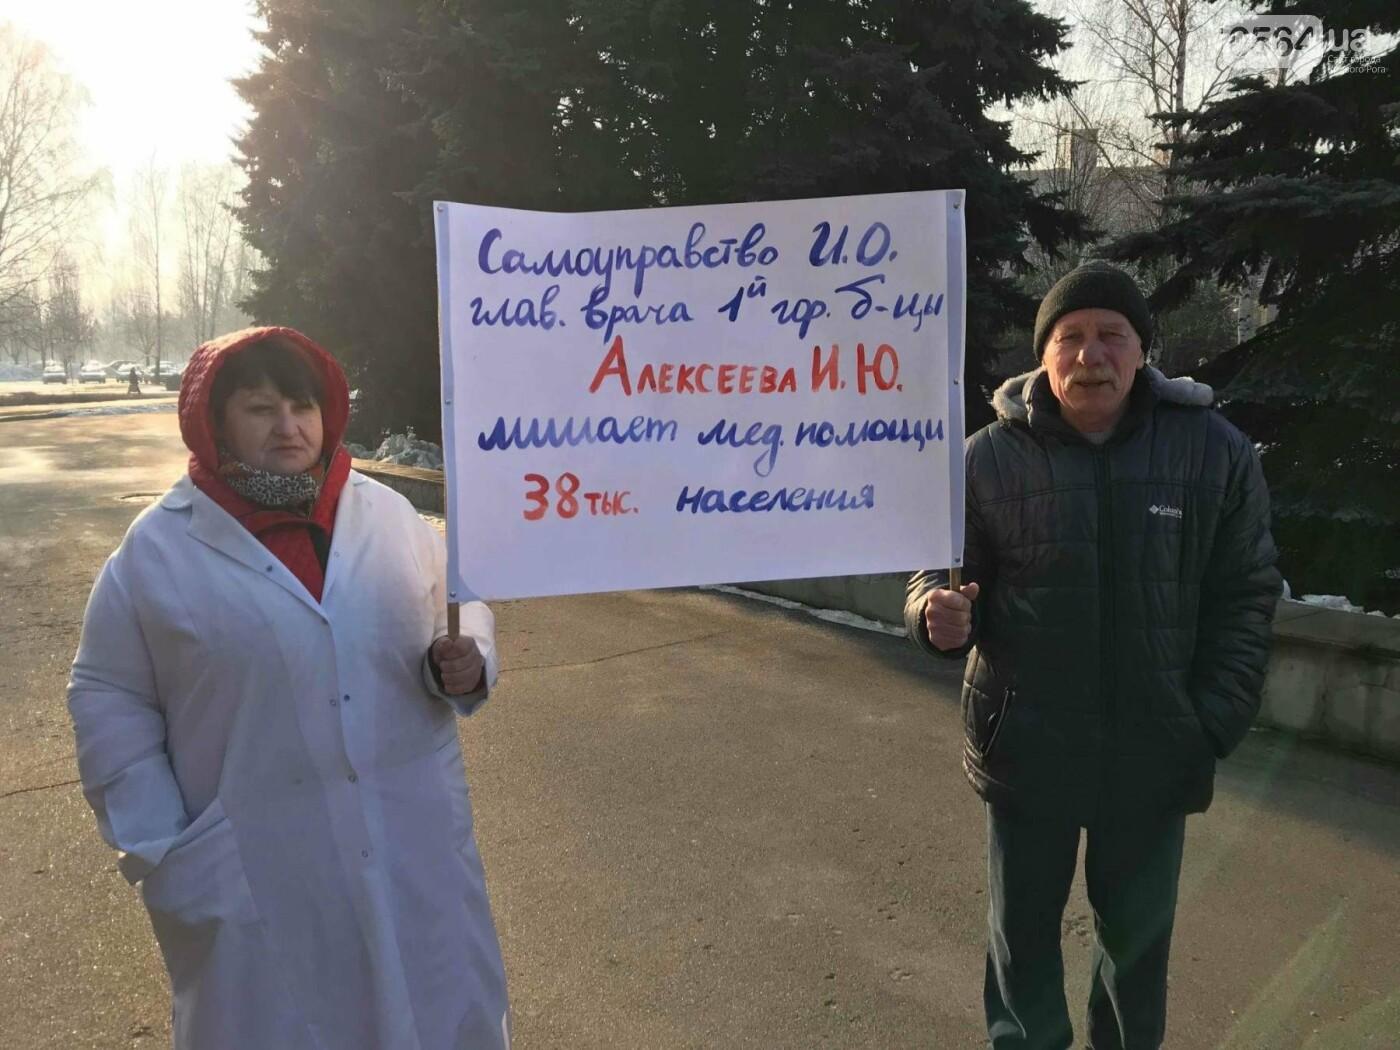 Под стенами Криворожского горисполкома проходит акция протеста медиков (ФОТО), фото-3